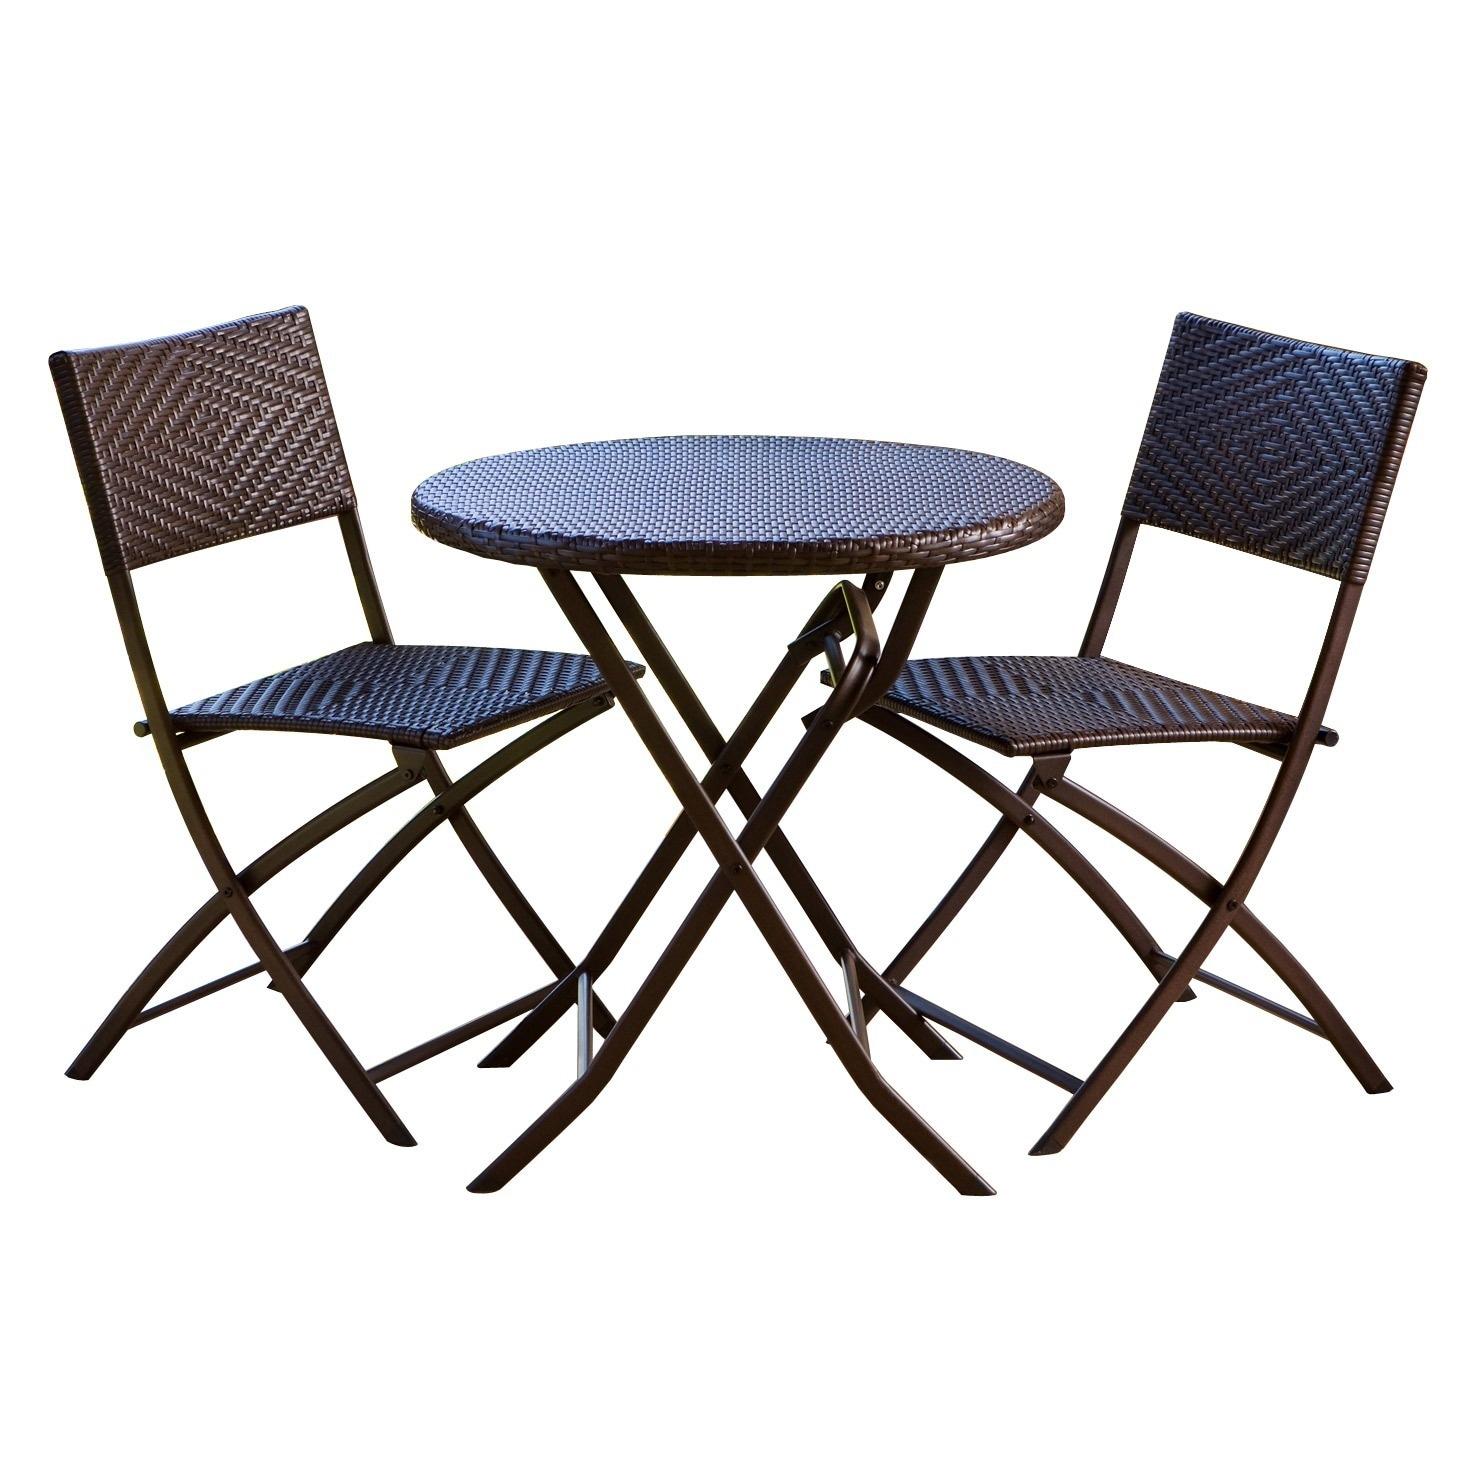 RST Cantina Bistro 3-piece Folding Dining Set, Brown, Siz...